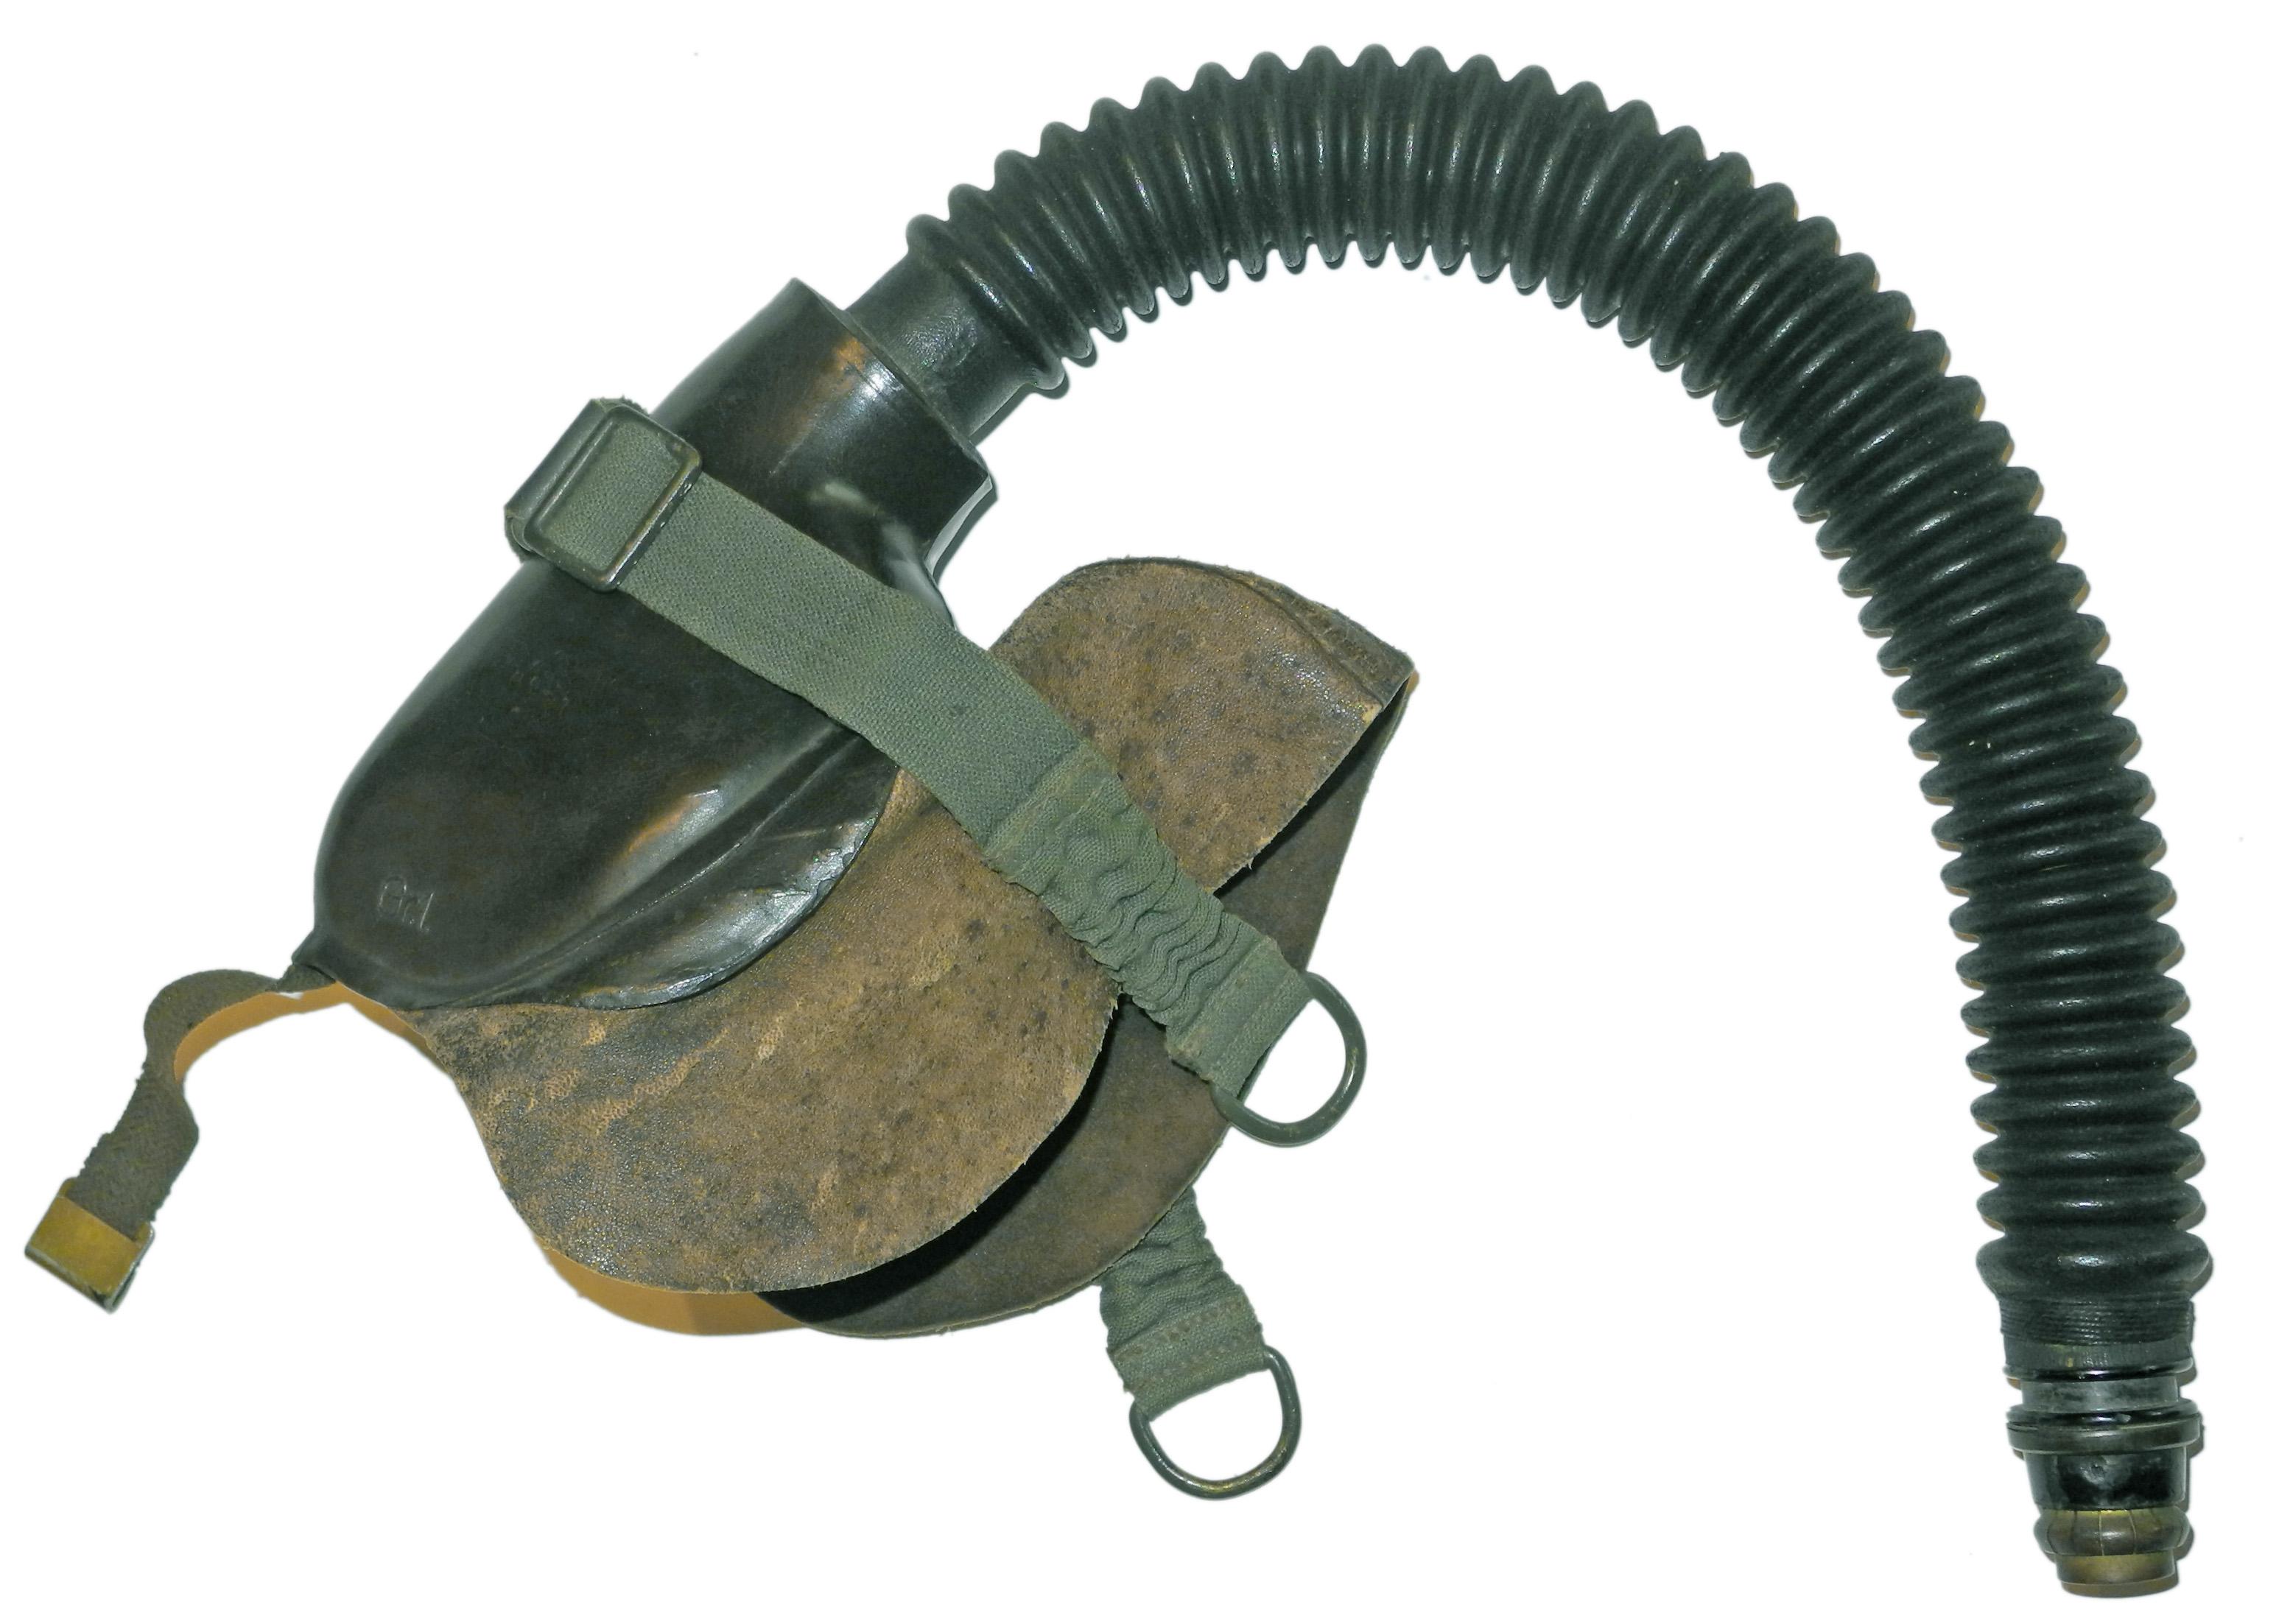 LW 10-67 3-strap oxygen mask486